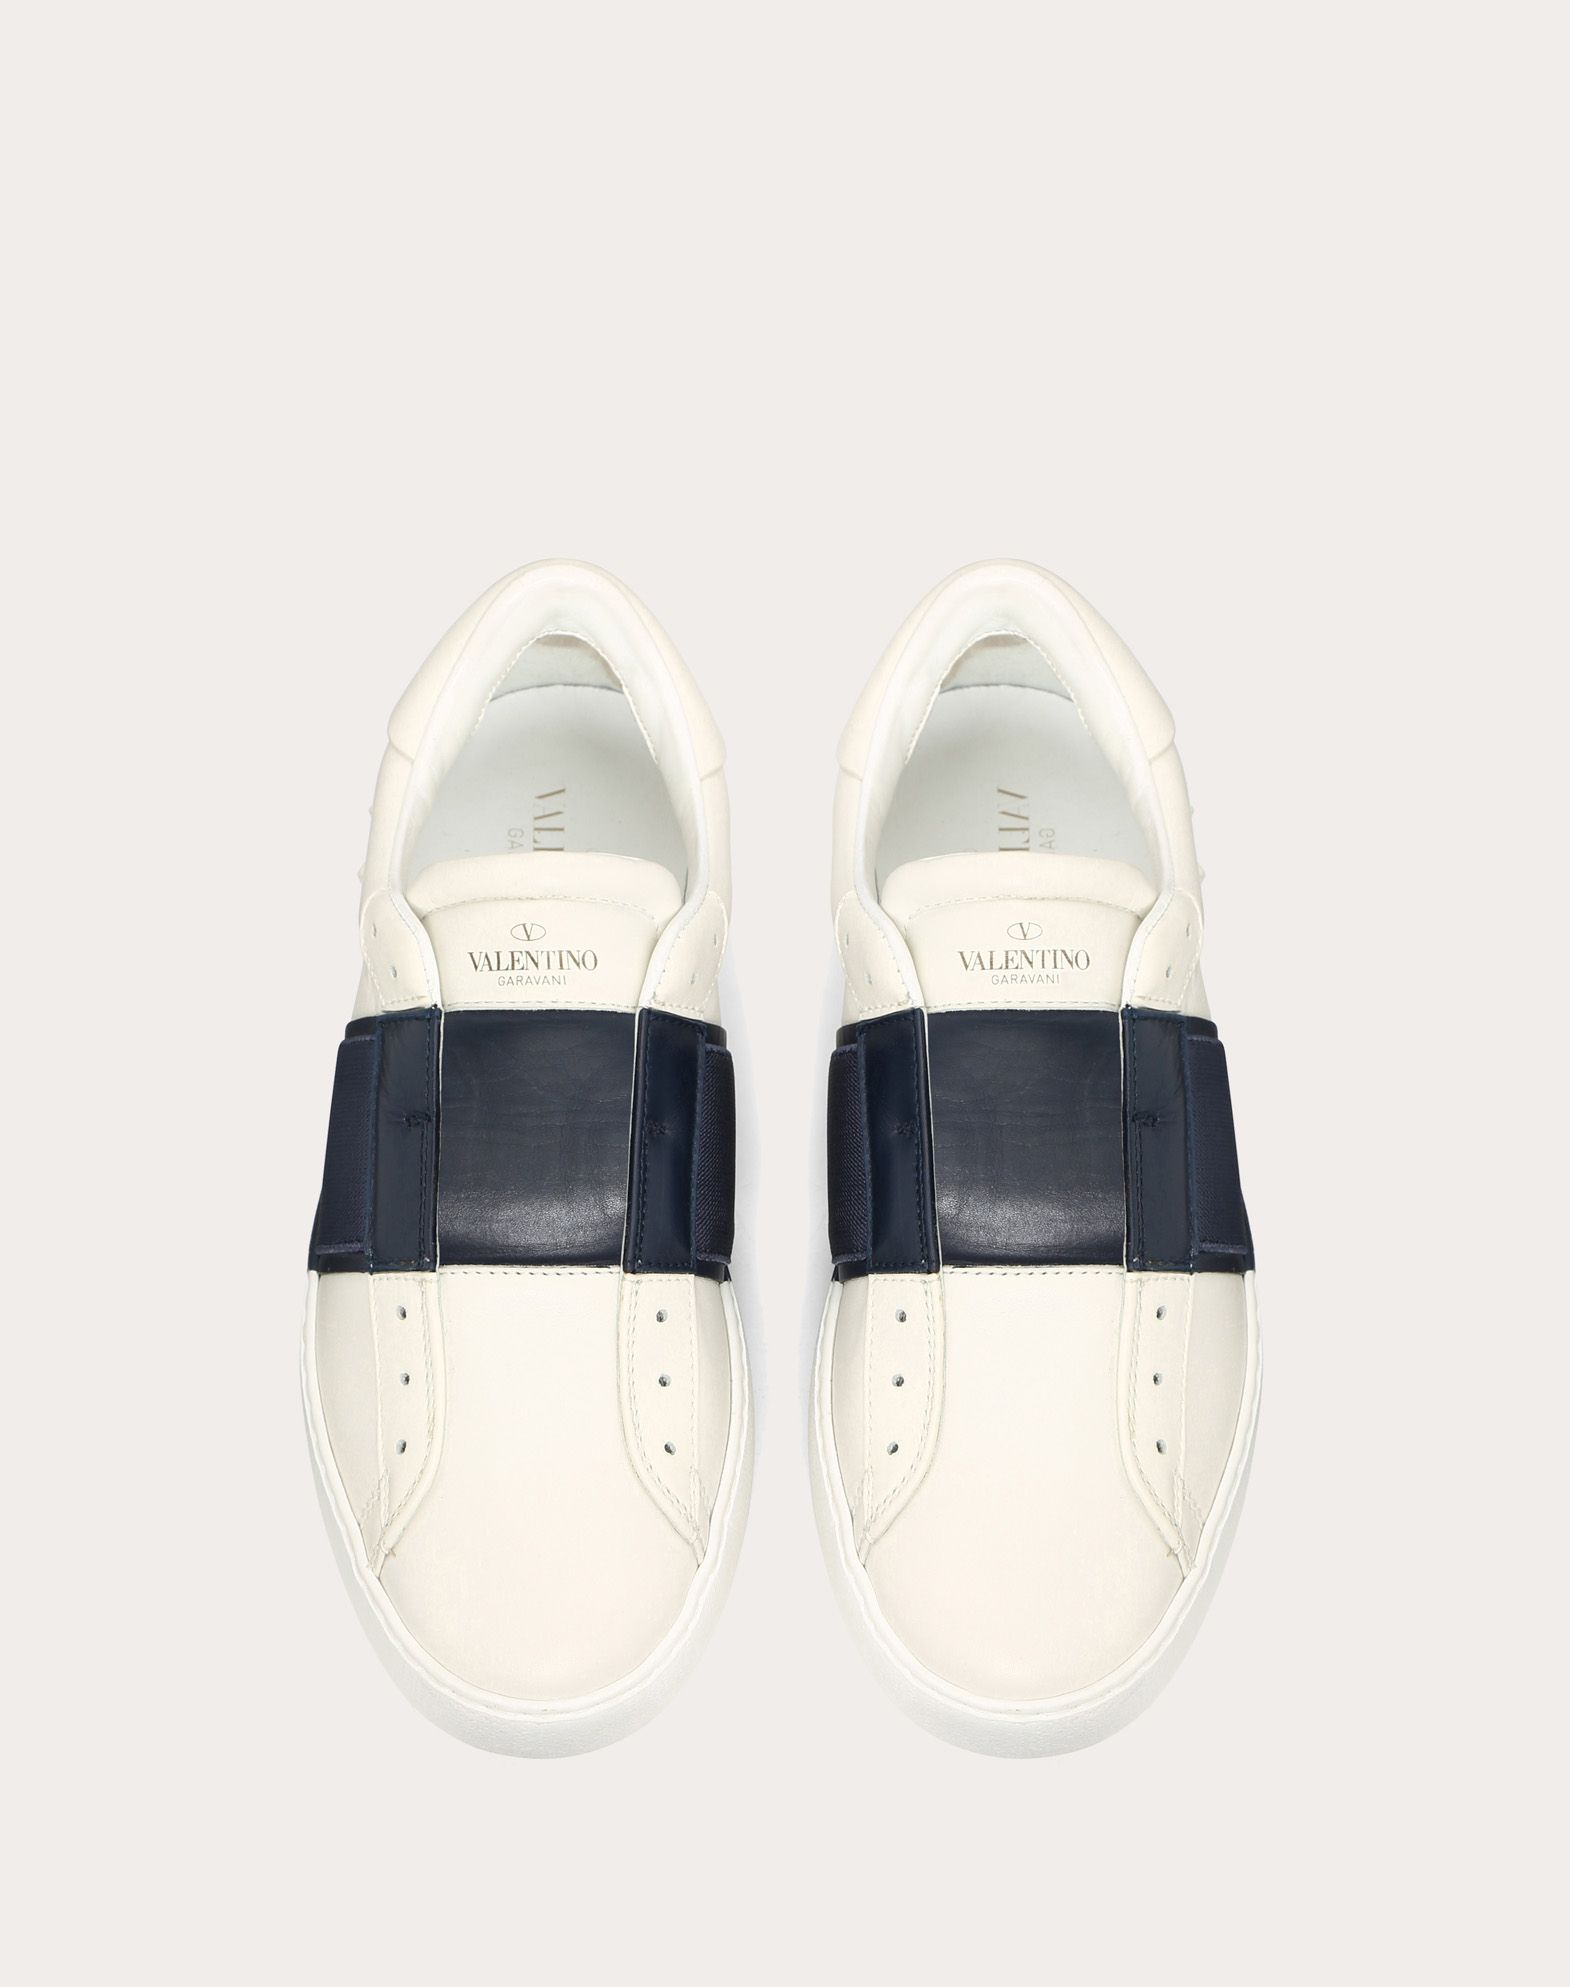 VALENTINO GARAVANI UOMO Elastic Sneaker LOW-TOP SNEAKERS U e